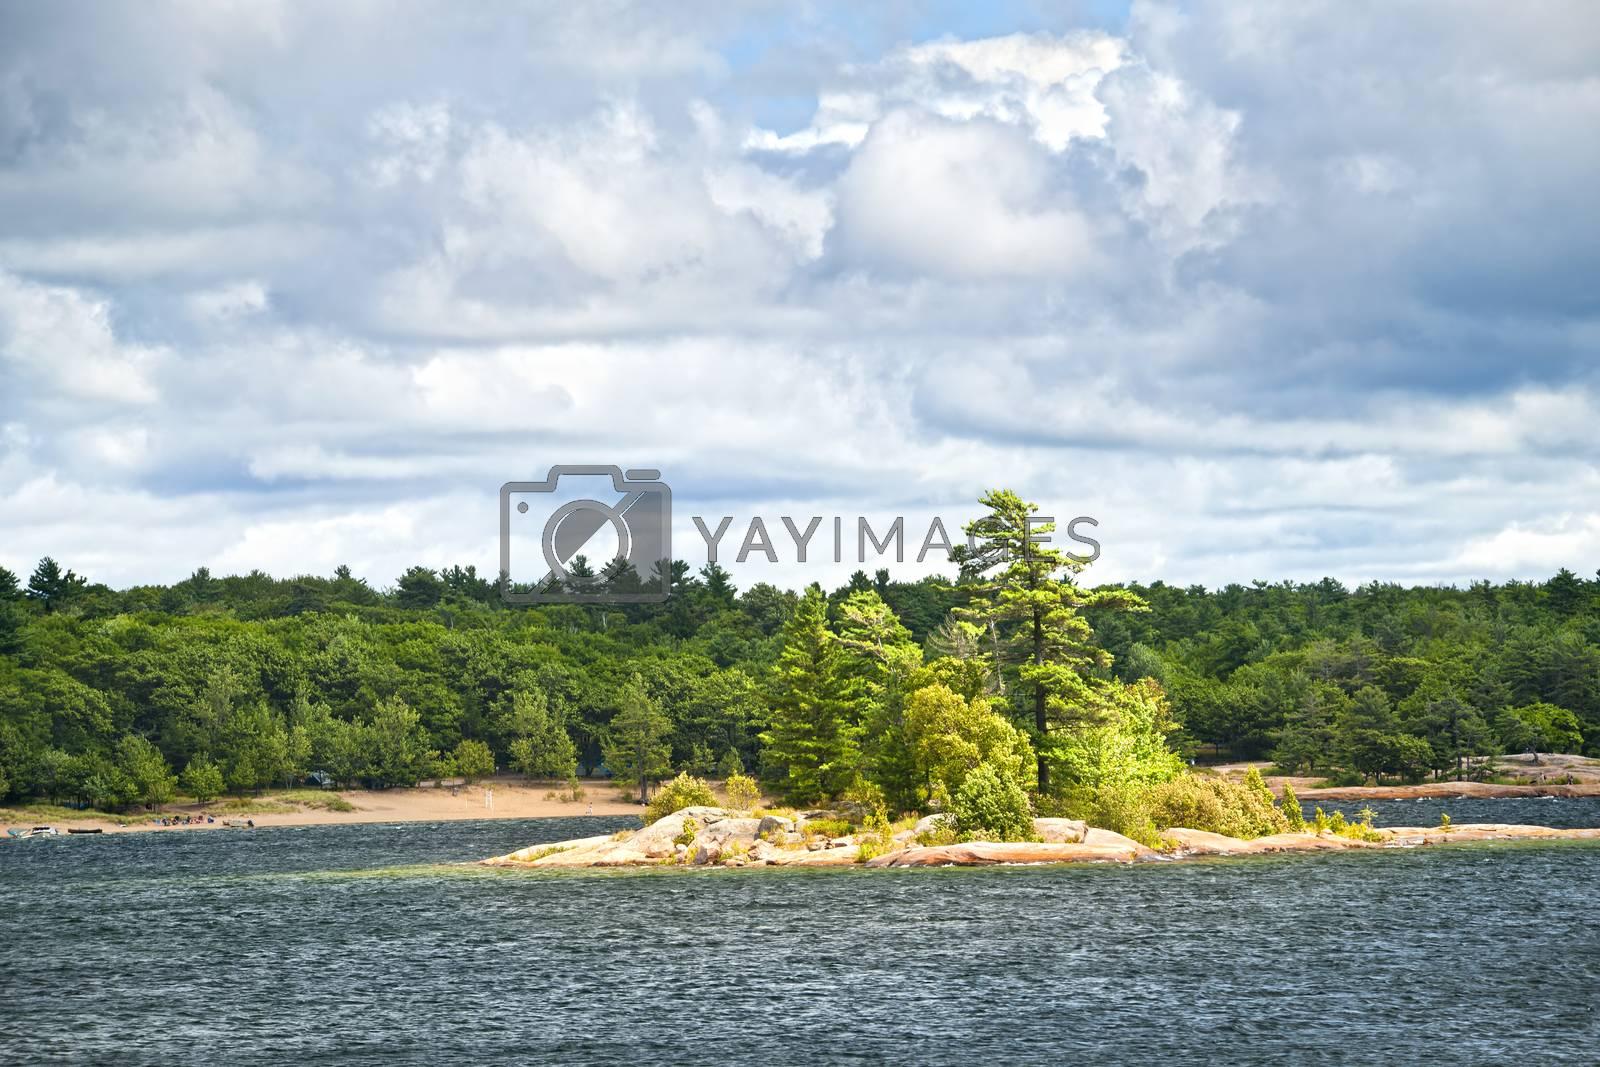 Small island and beach in Killbear provincial park near Parry Sound, Ontario Canada